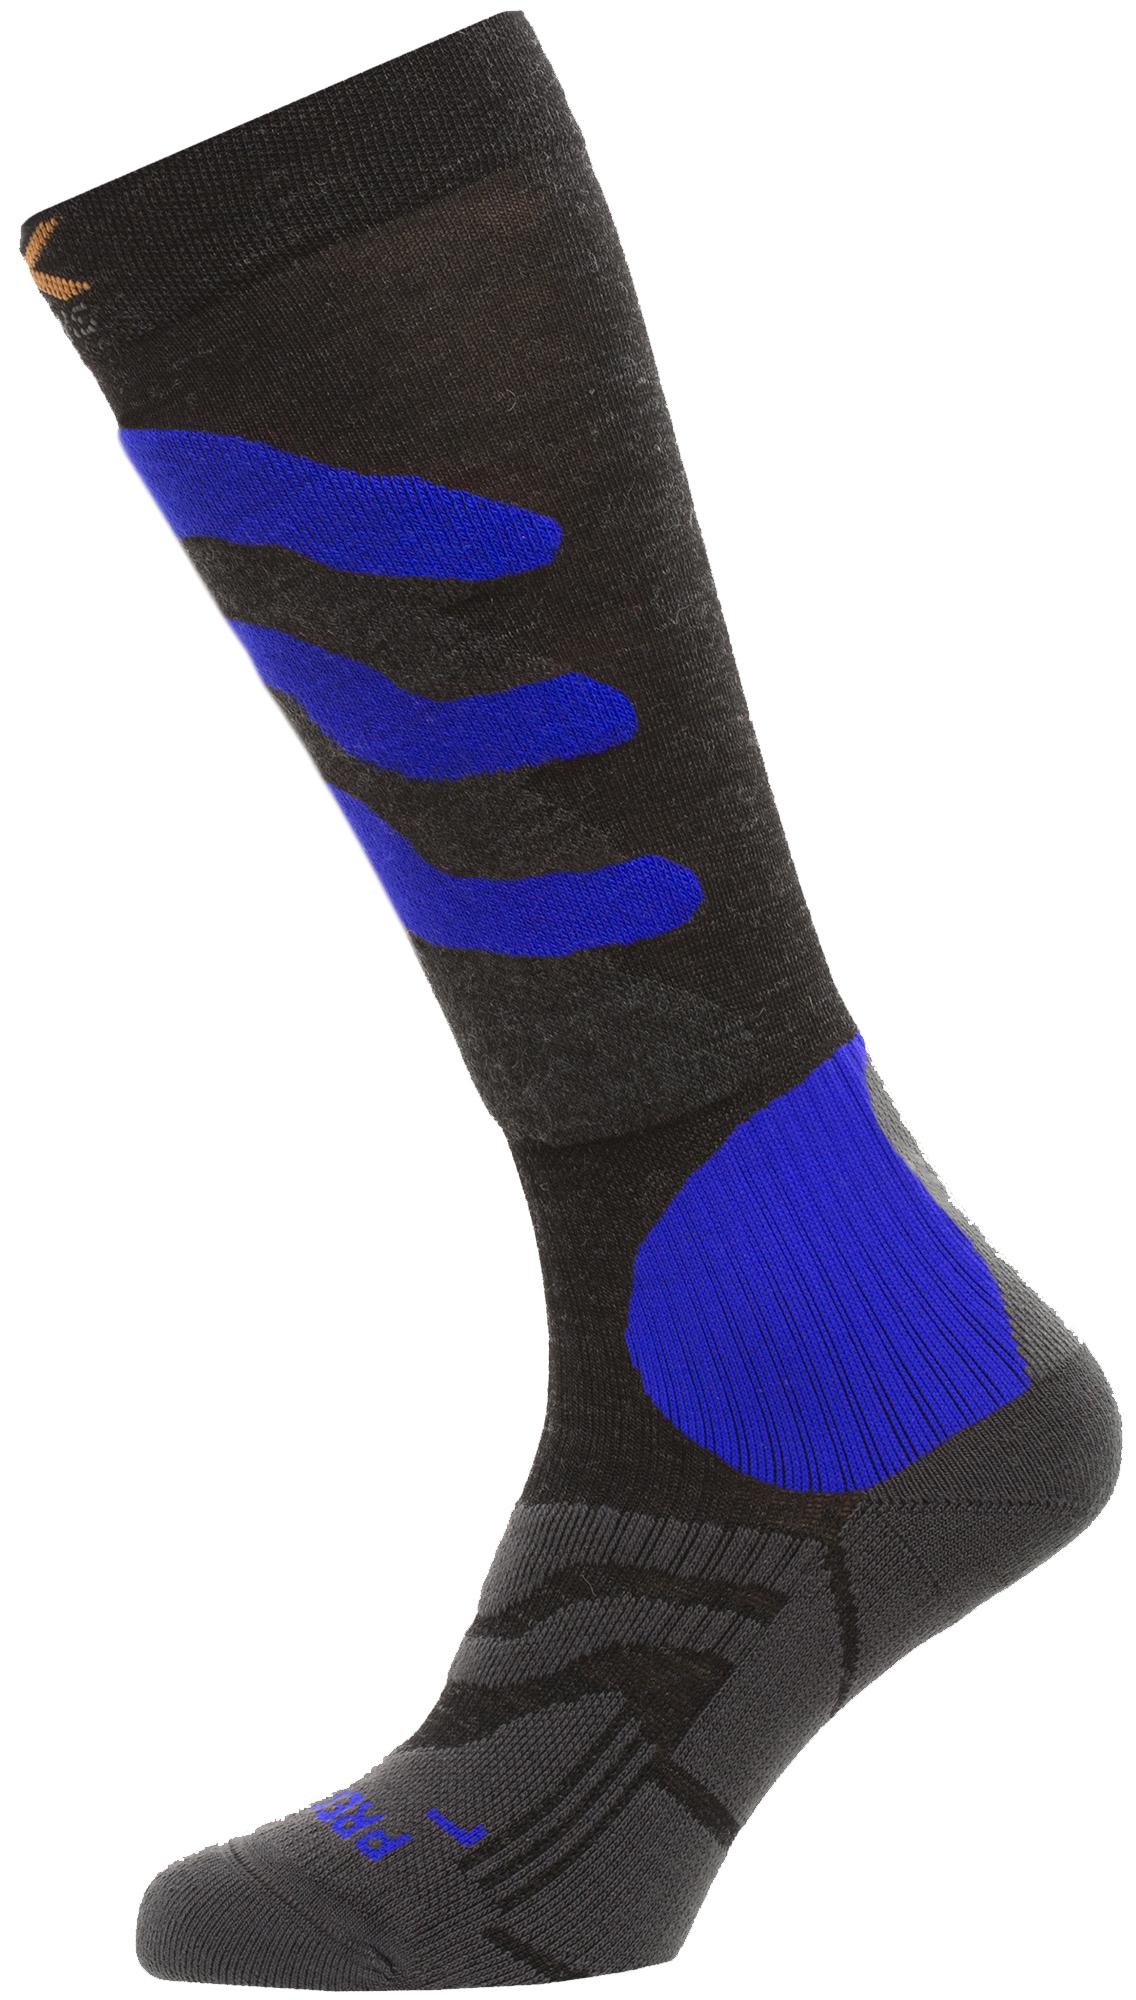 X-Socks Гольфы X-Socks, 1 пара, размер 45-47 носки x socks x socks skiing light